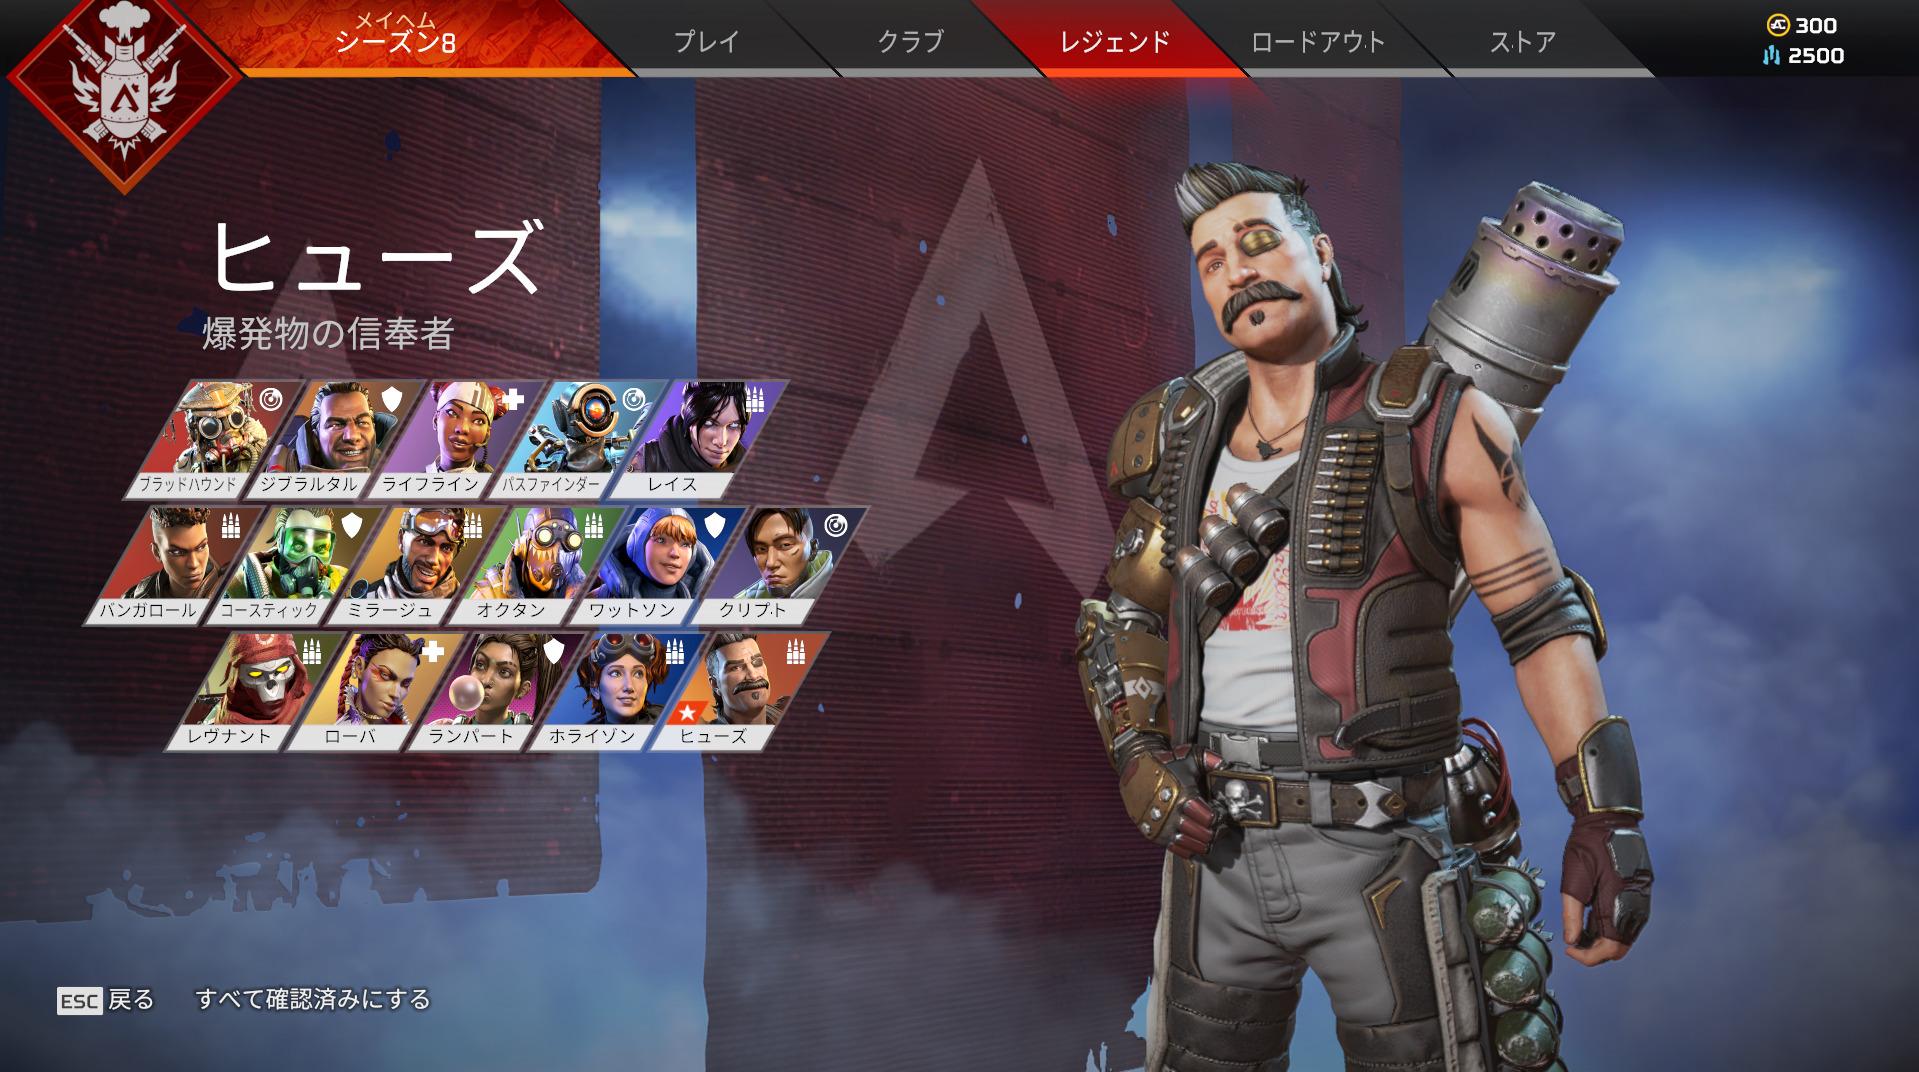 【Apex Legends】ヒューズ 日本語セリフ一覧【基本ボイス】【エーペックスレジェンズ】